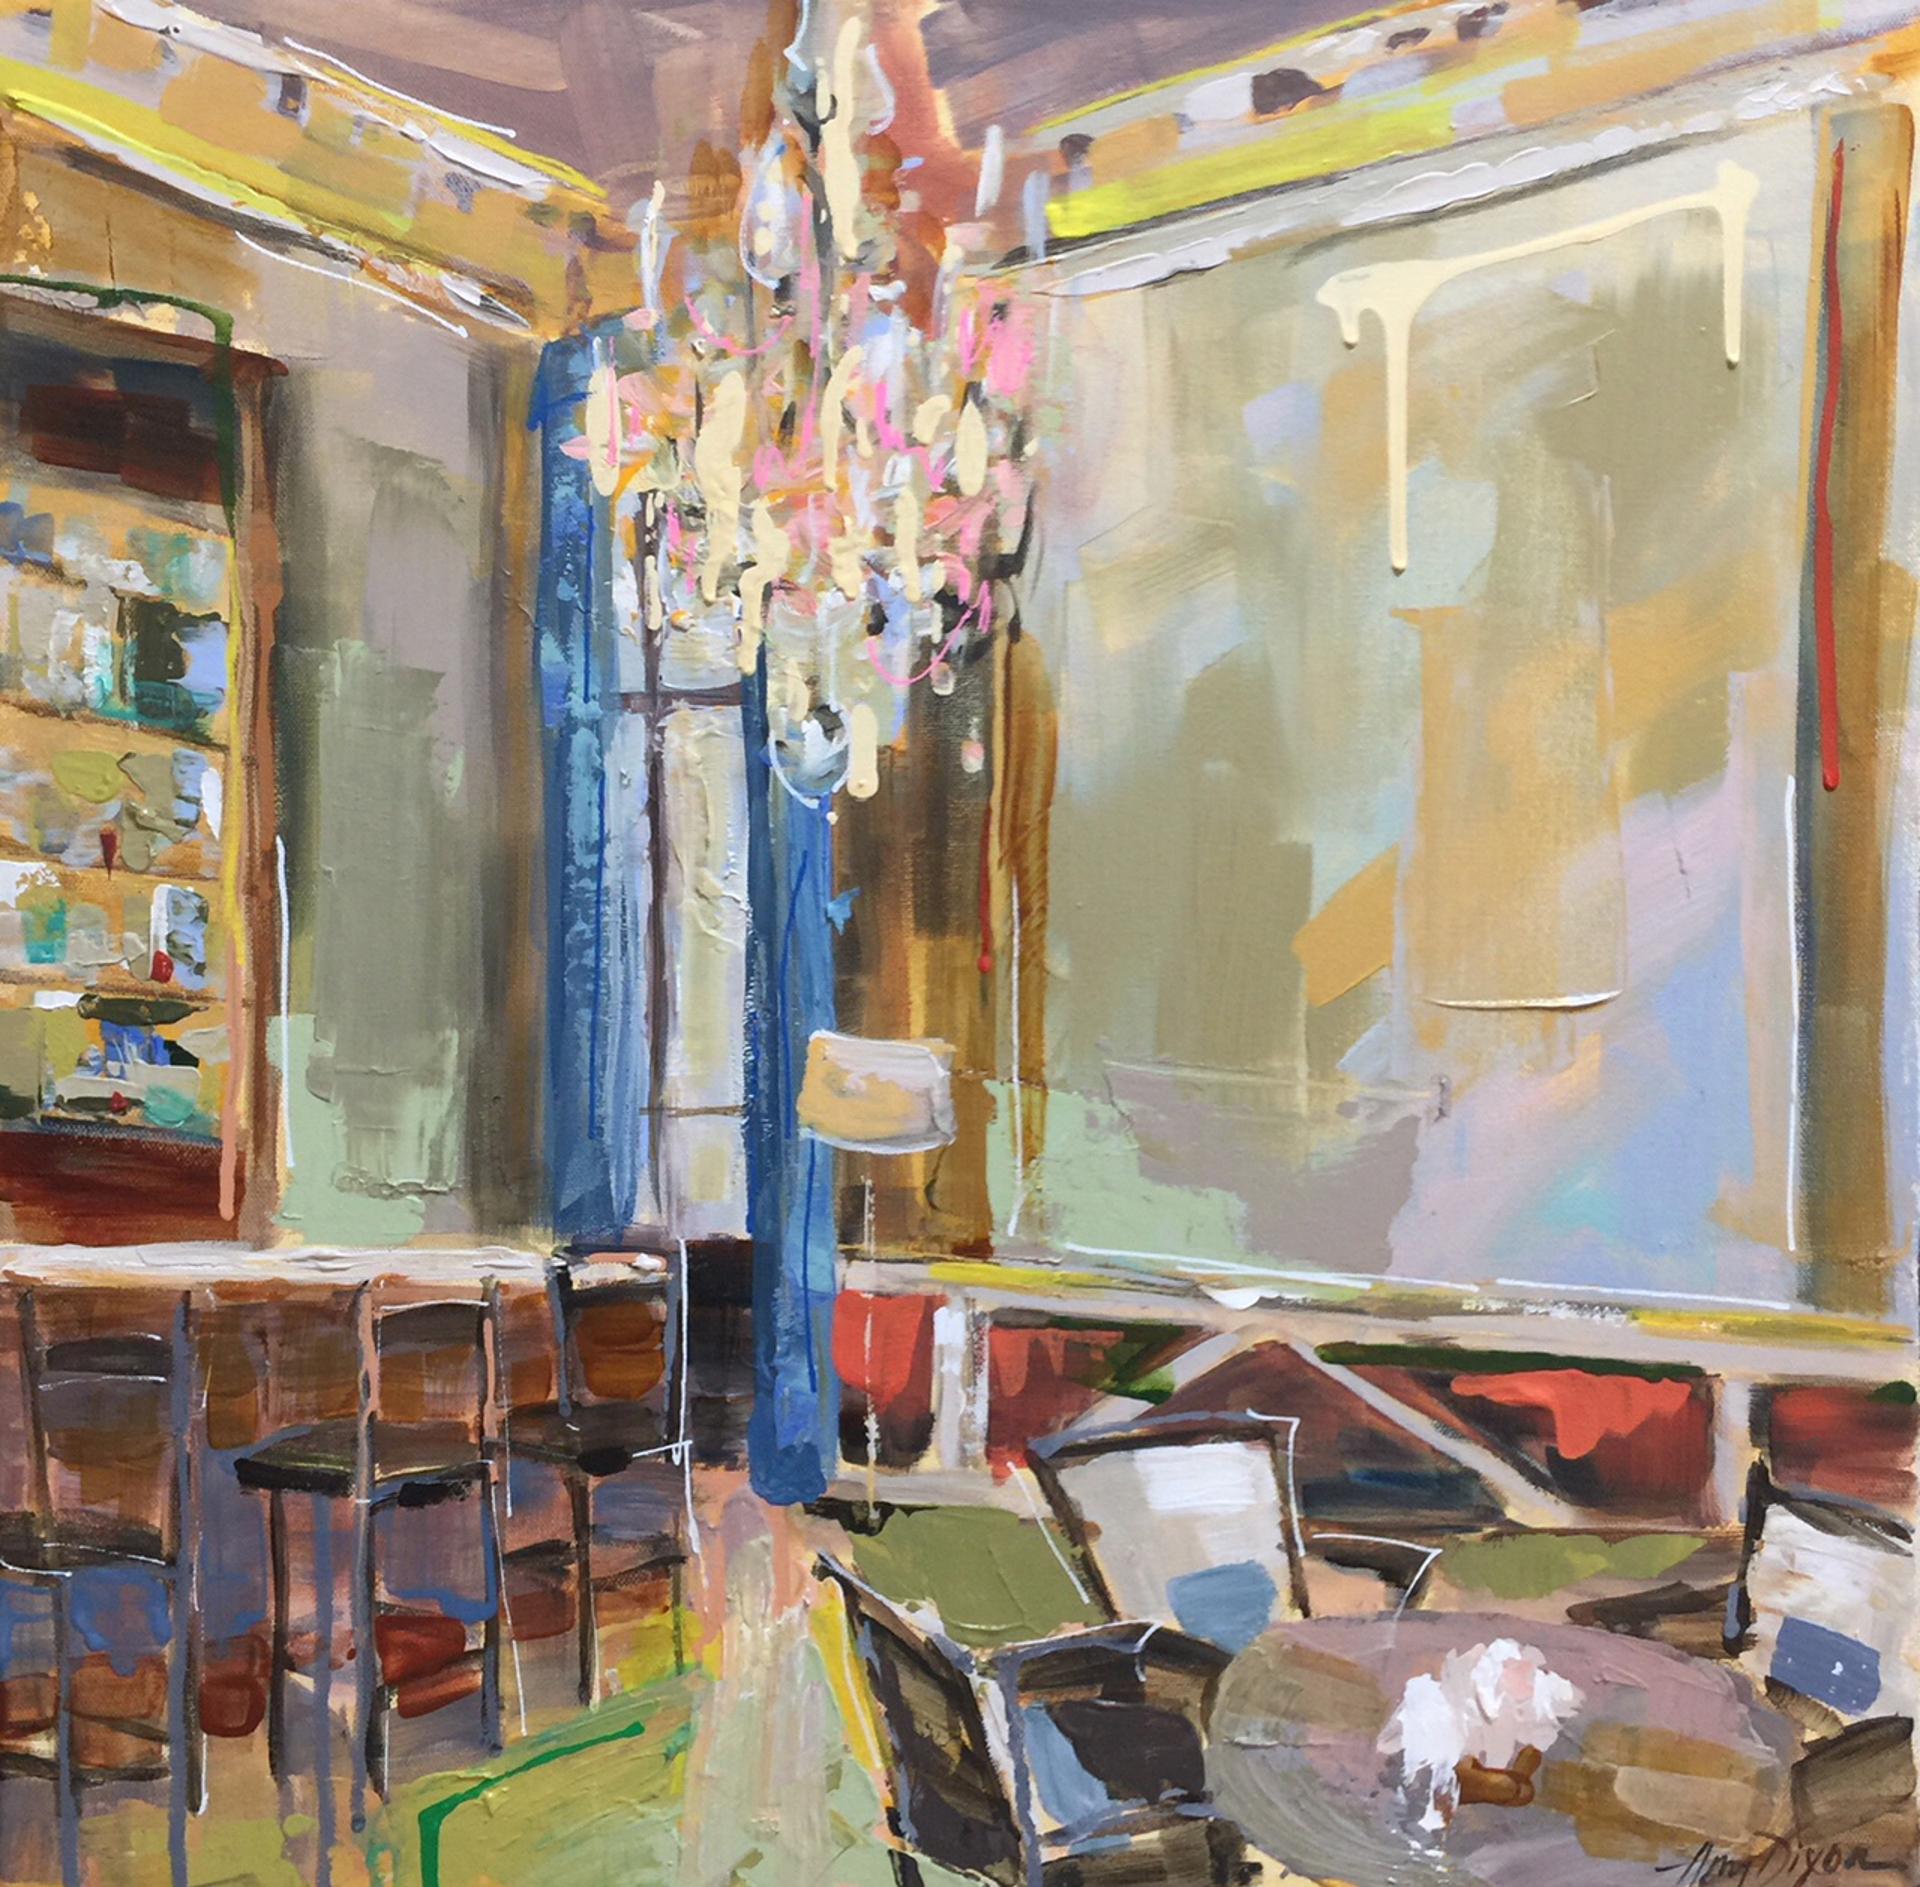 Venetian Hotel Bar (The Aman) by Amy Dixon